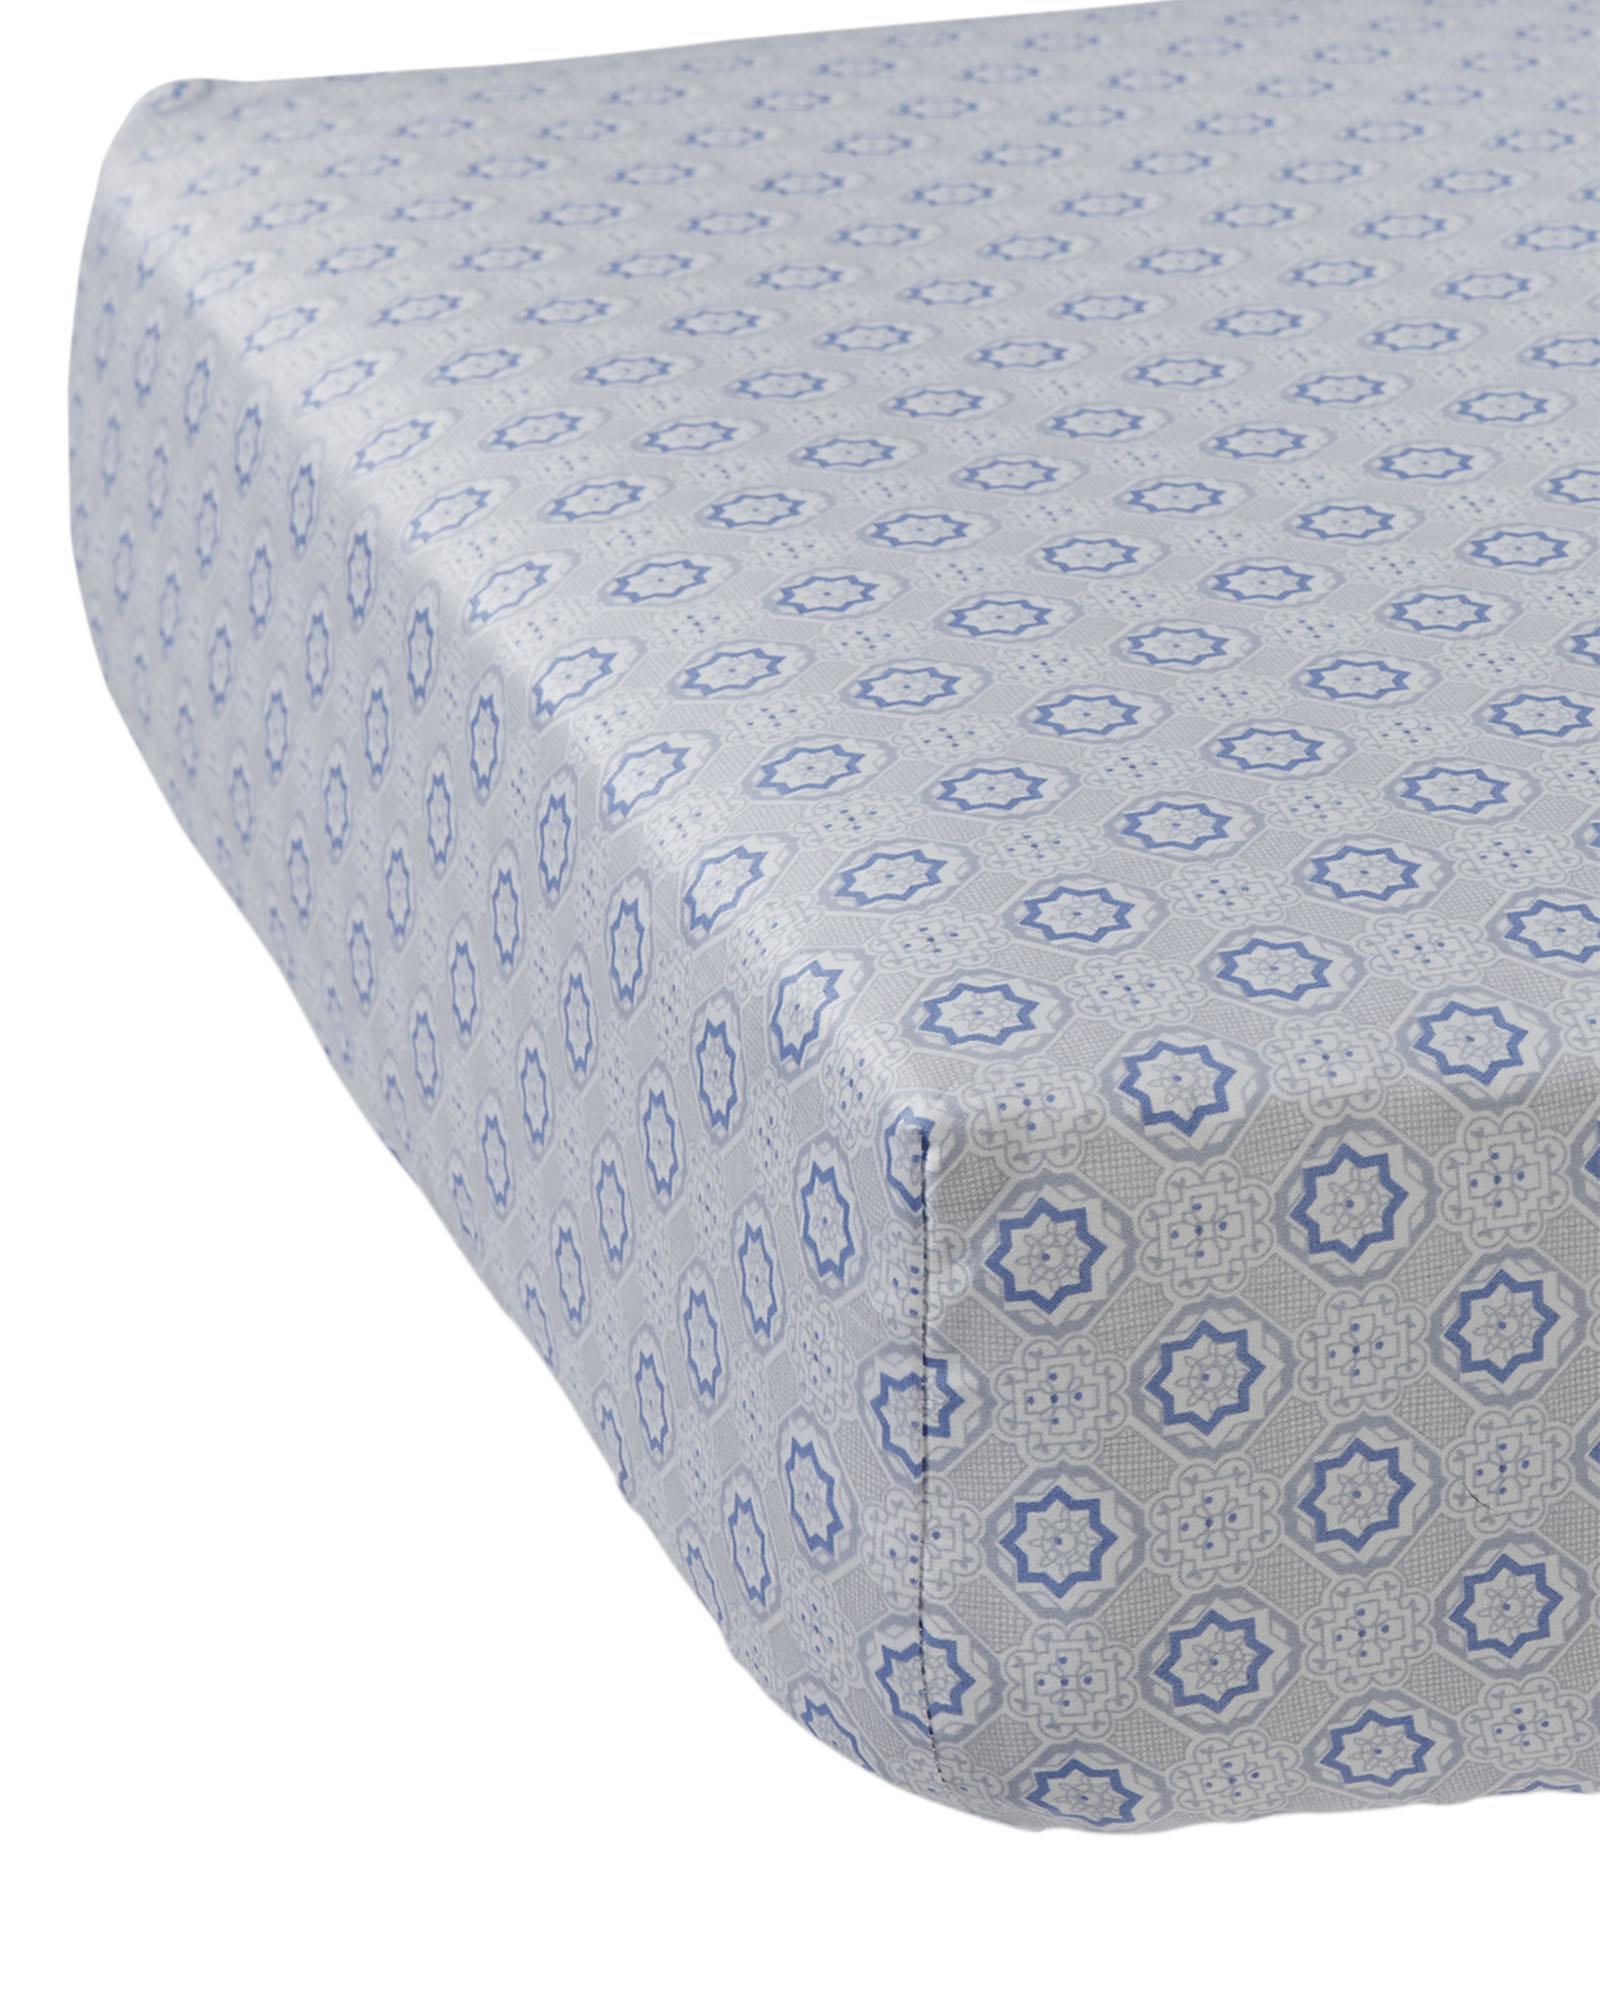 Mosaic Crib Sheet - $36.00